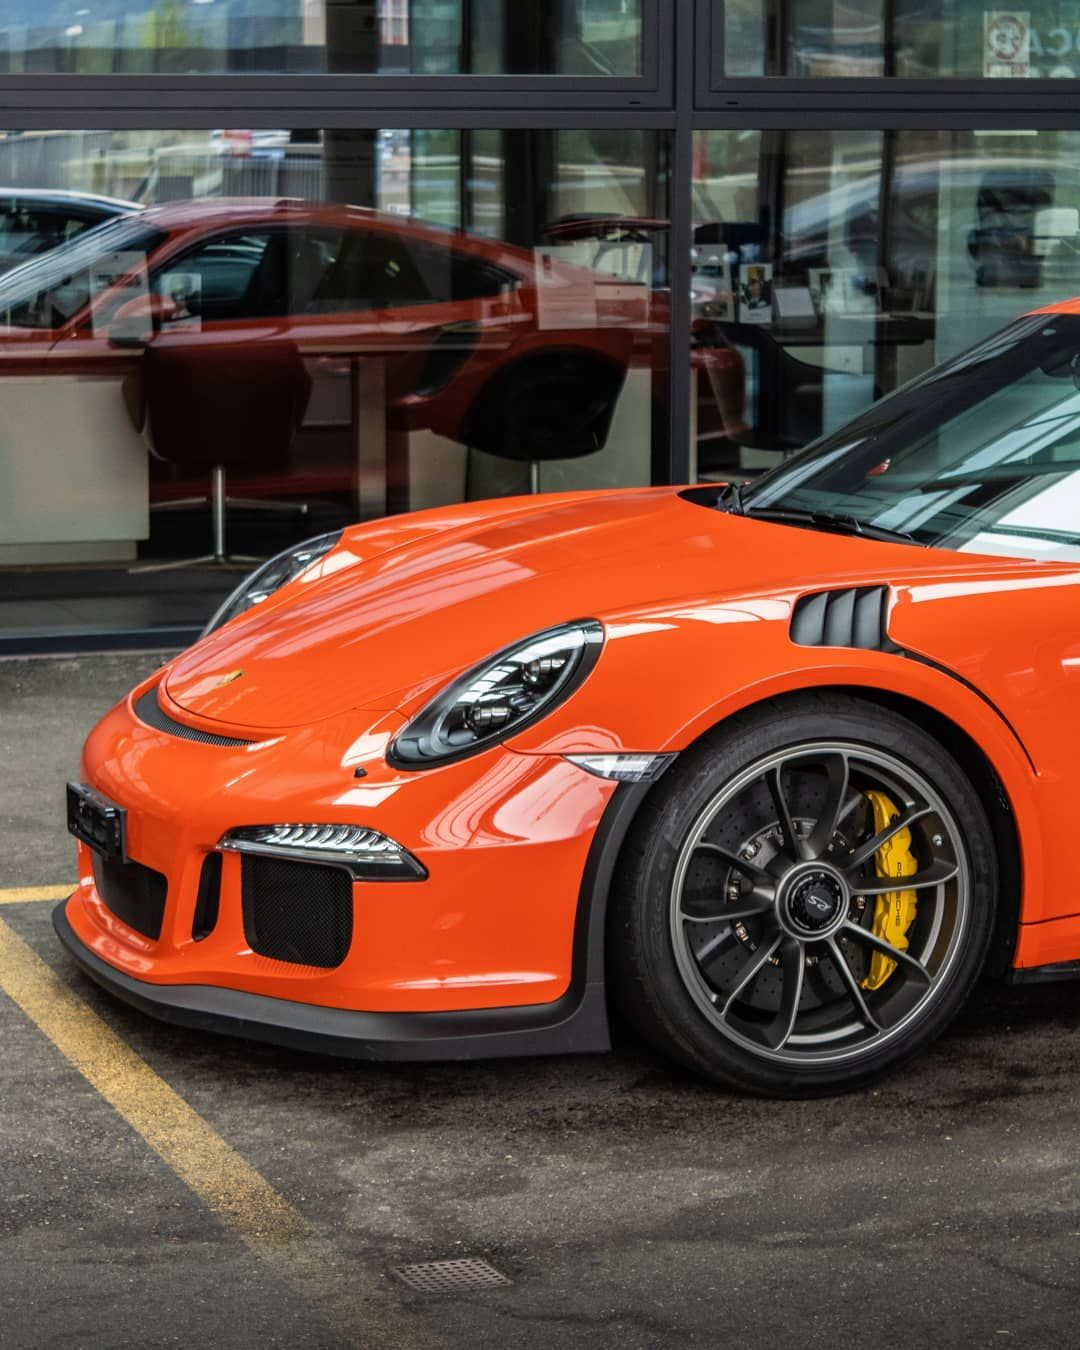 Porsche GT3 RS Porsche, Super luxury cars, Porsche gt3